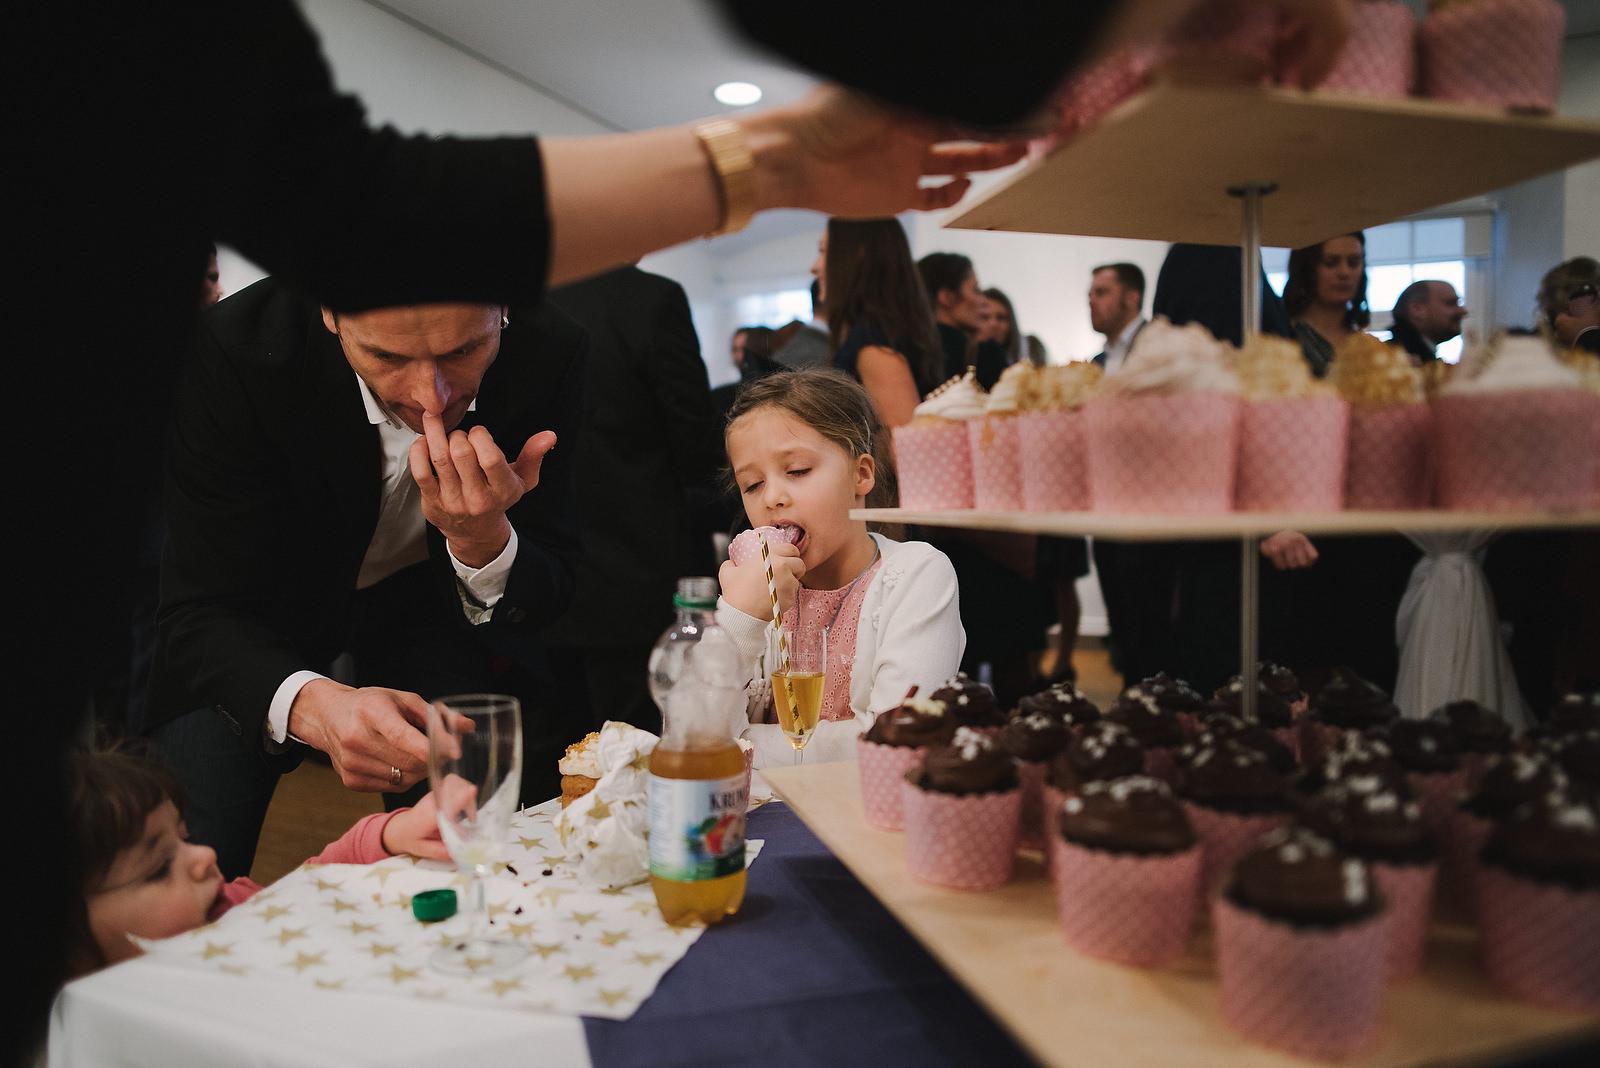 Fotograf Konstanz - Silvester Wedding in Hagnau / Friedrichshafen at Lake of Constance  - 36 -